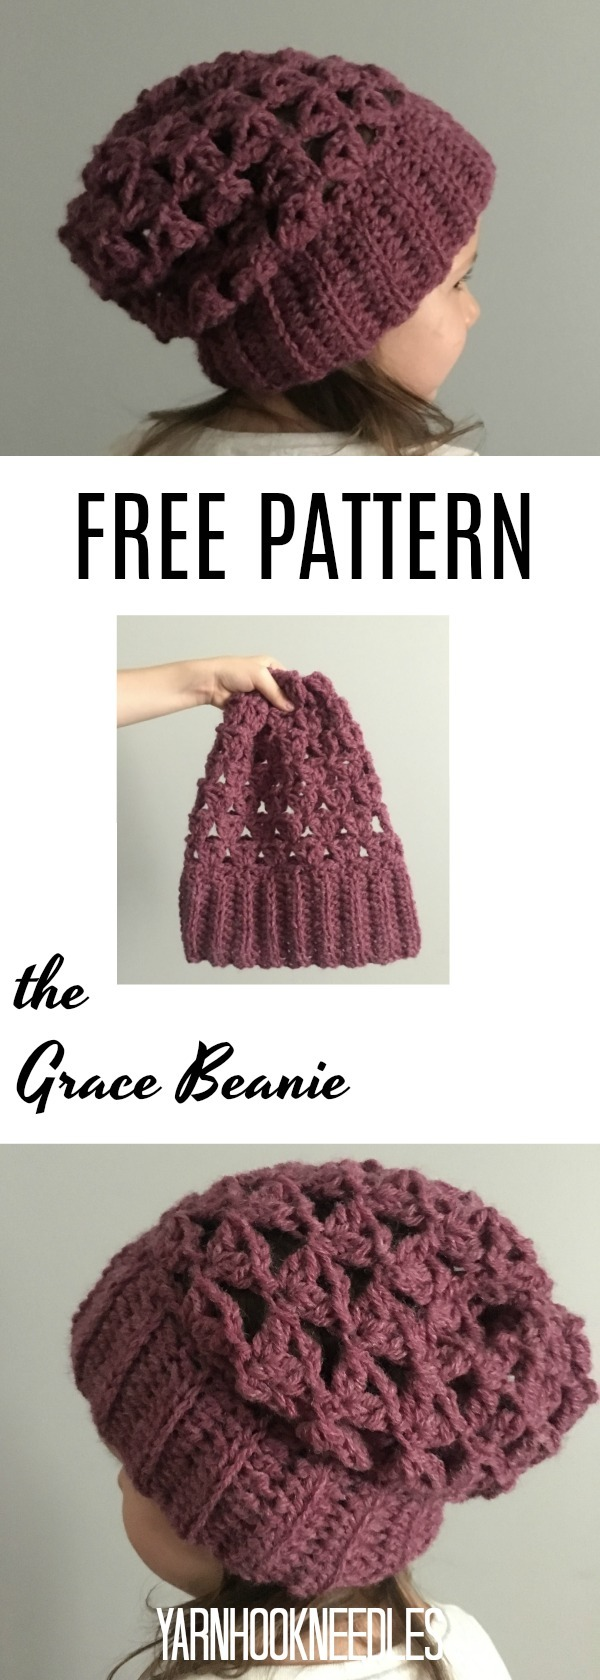 America Flag Crochet Blanket with FREE Pattern! - YarnHookNeedles